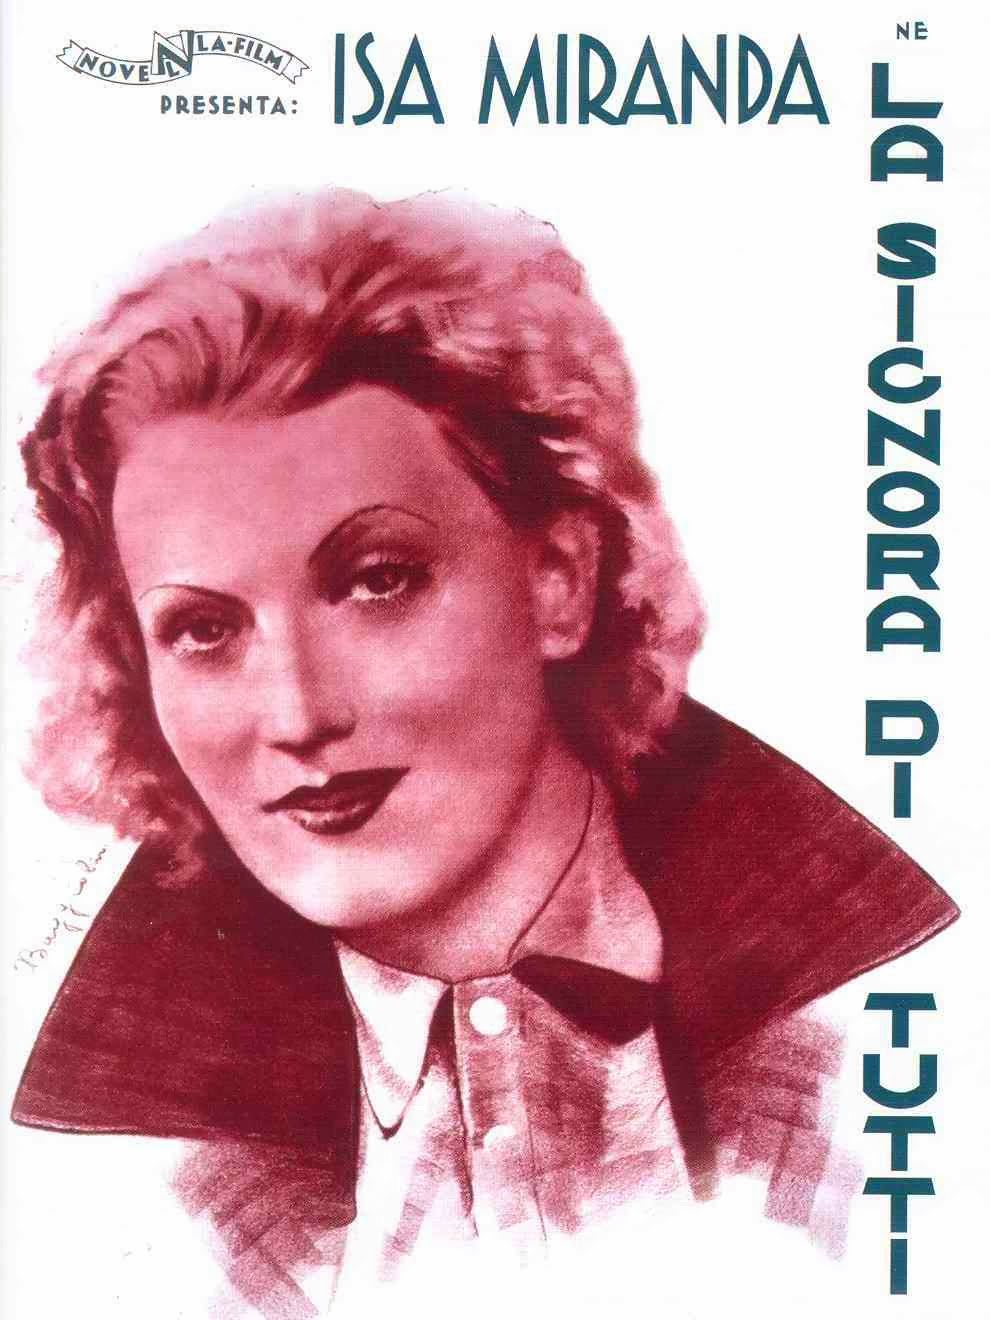 Ver película : La mujer de todos, La signora di tutti de 1934 -Max Ophïls-